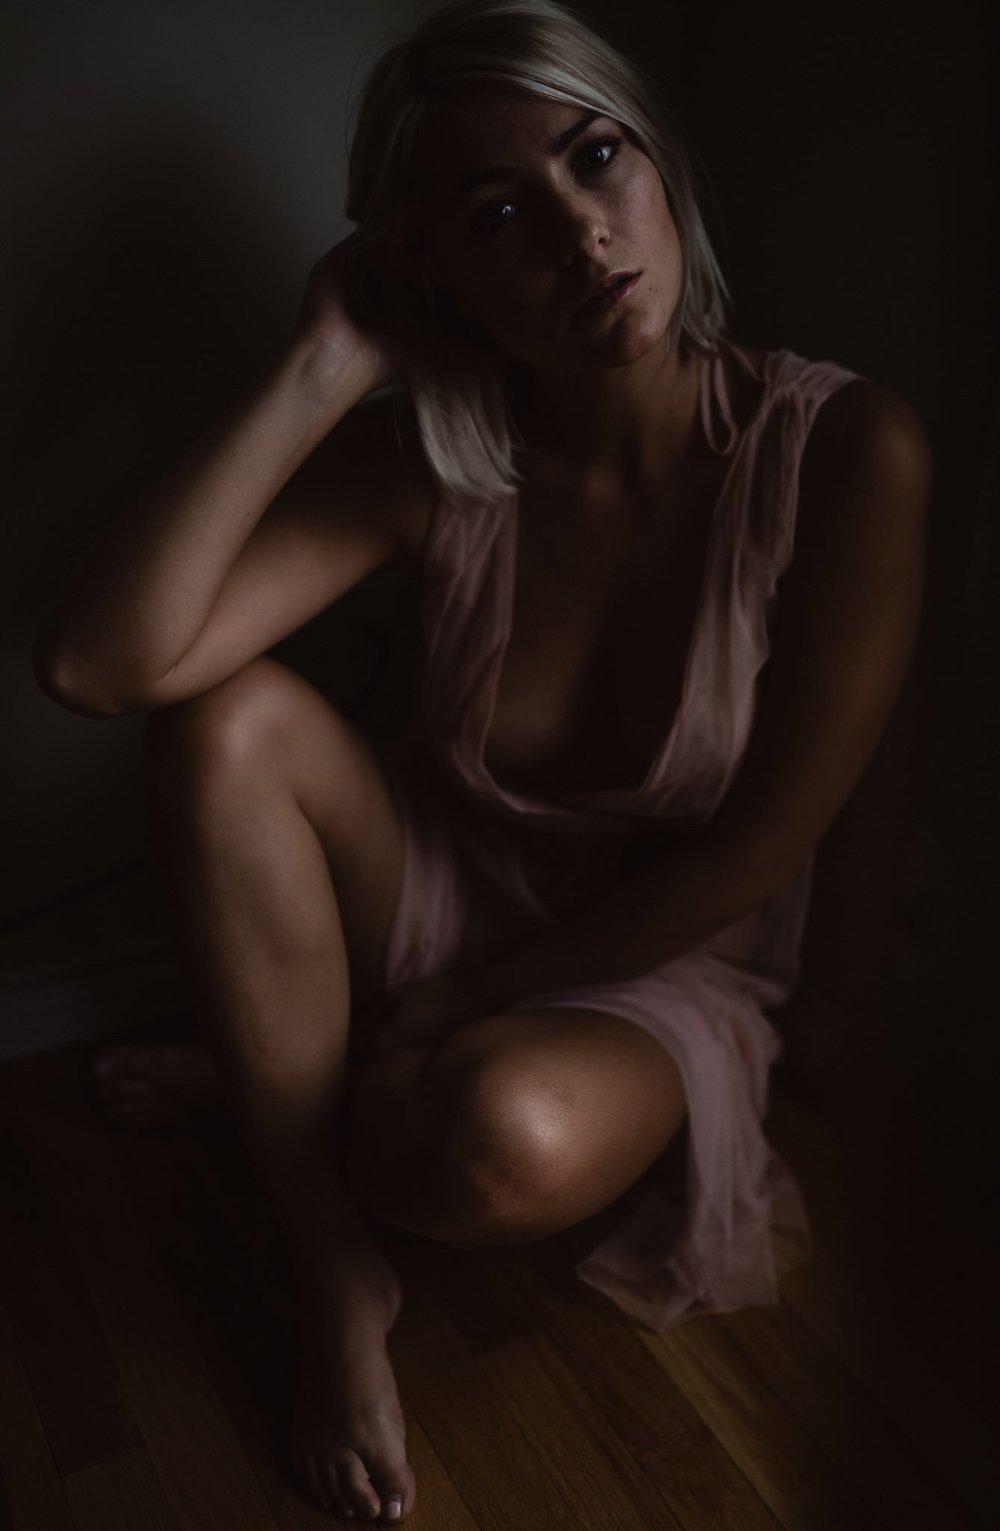 By Danielle Serres